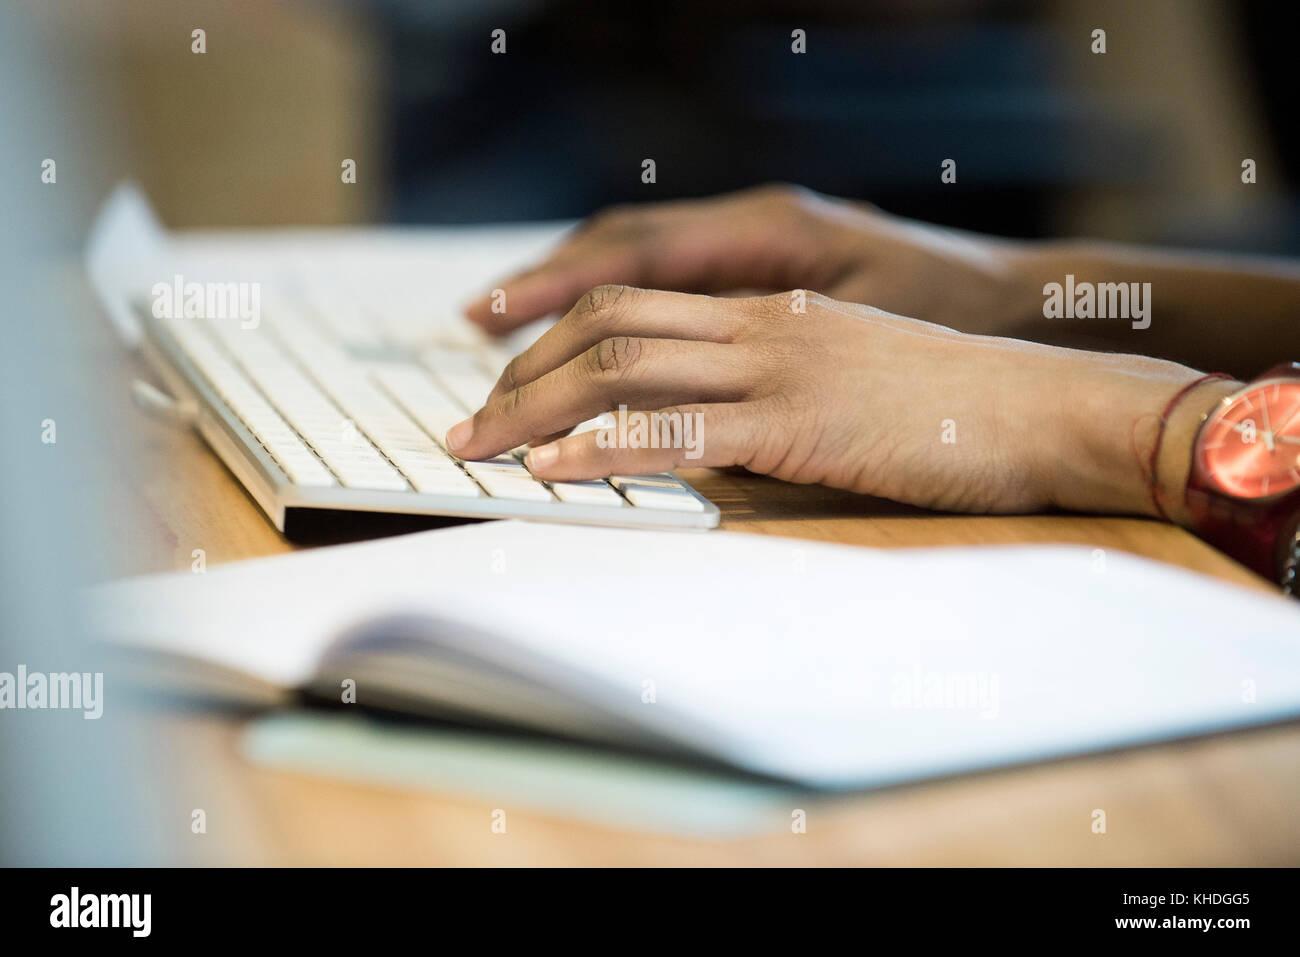 Woman typing on keyboard Stock Photo